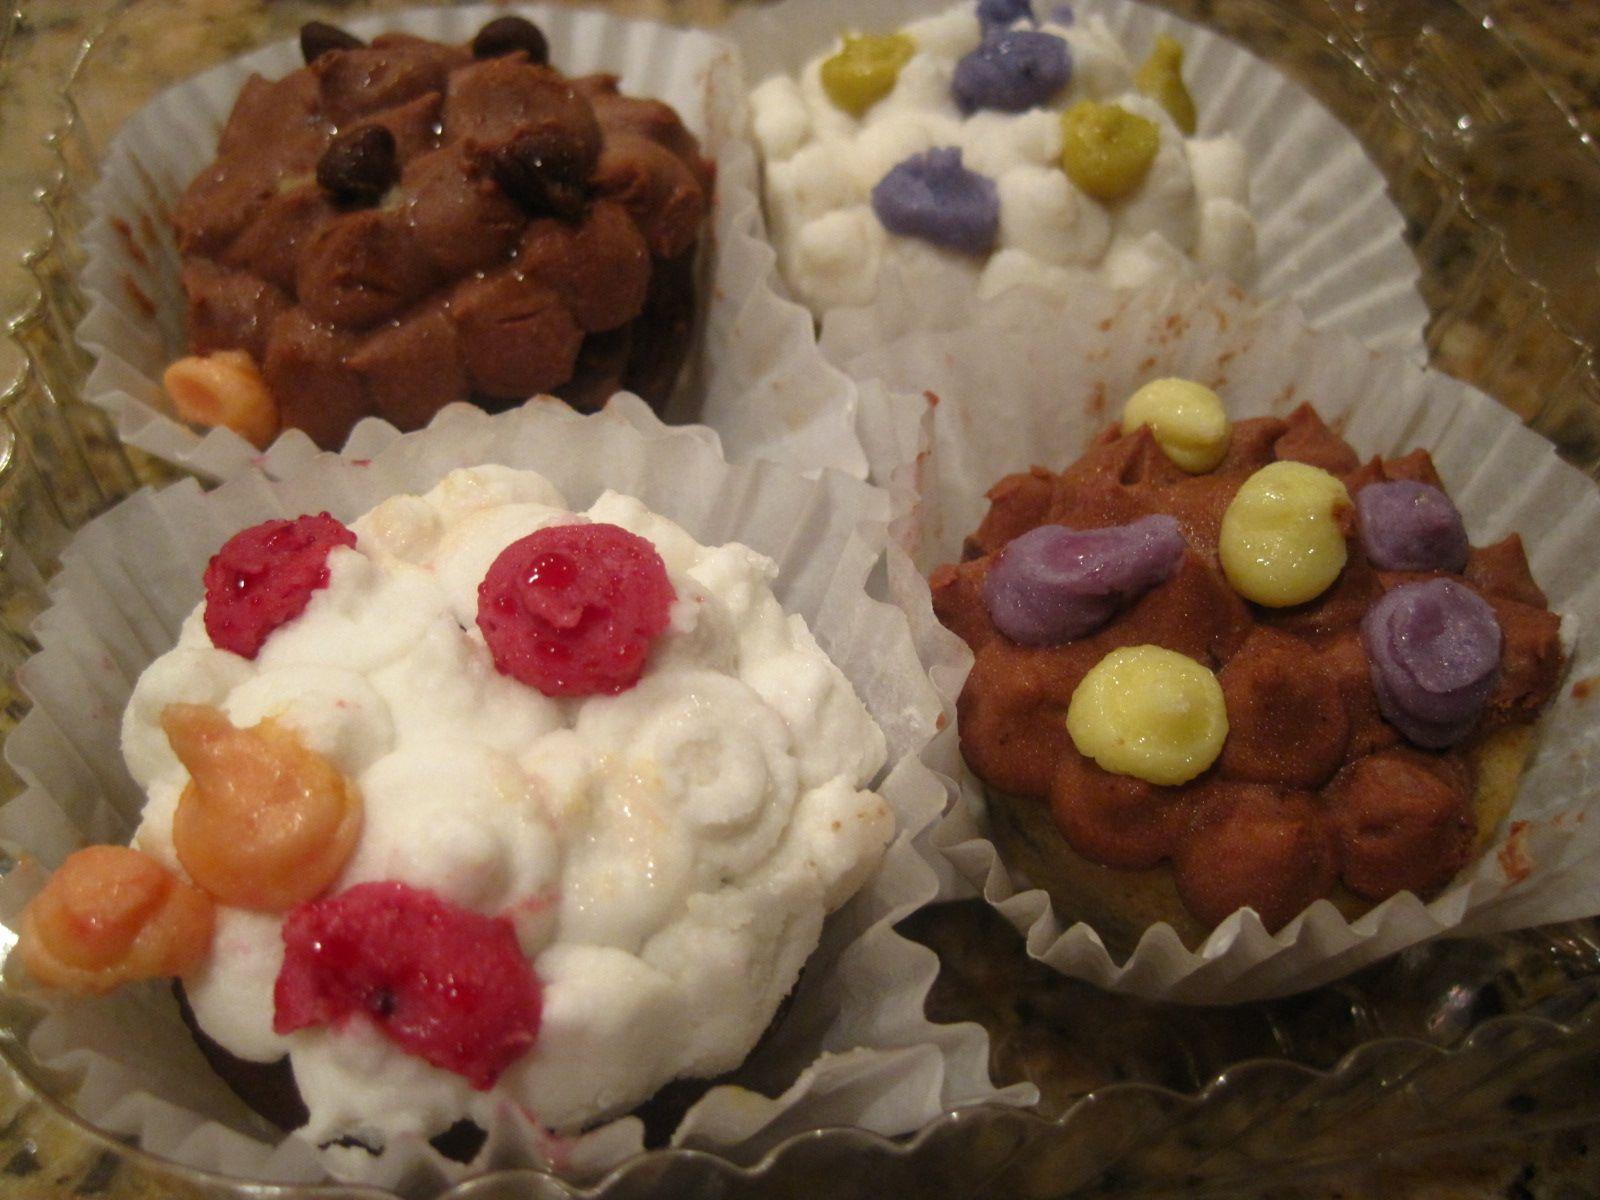 raw vegan cupcakes | Love to eat! | Pinterest